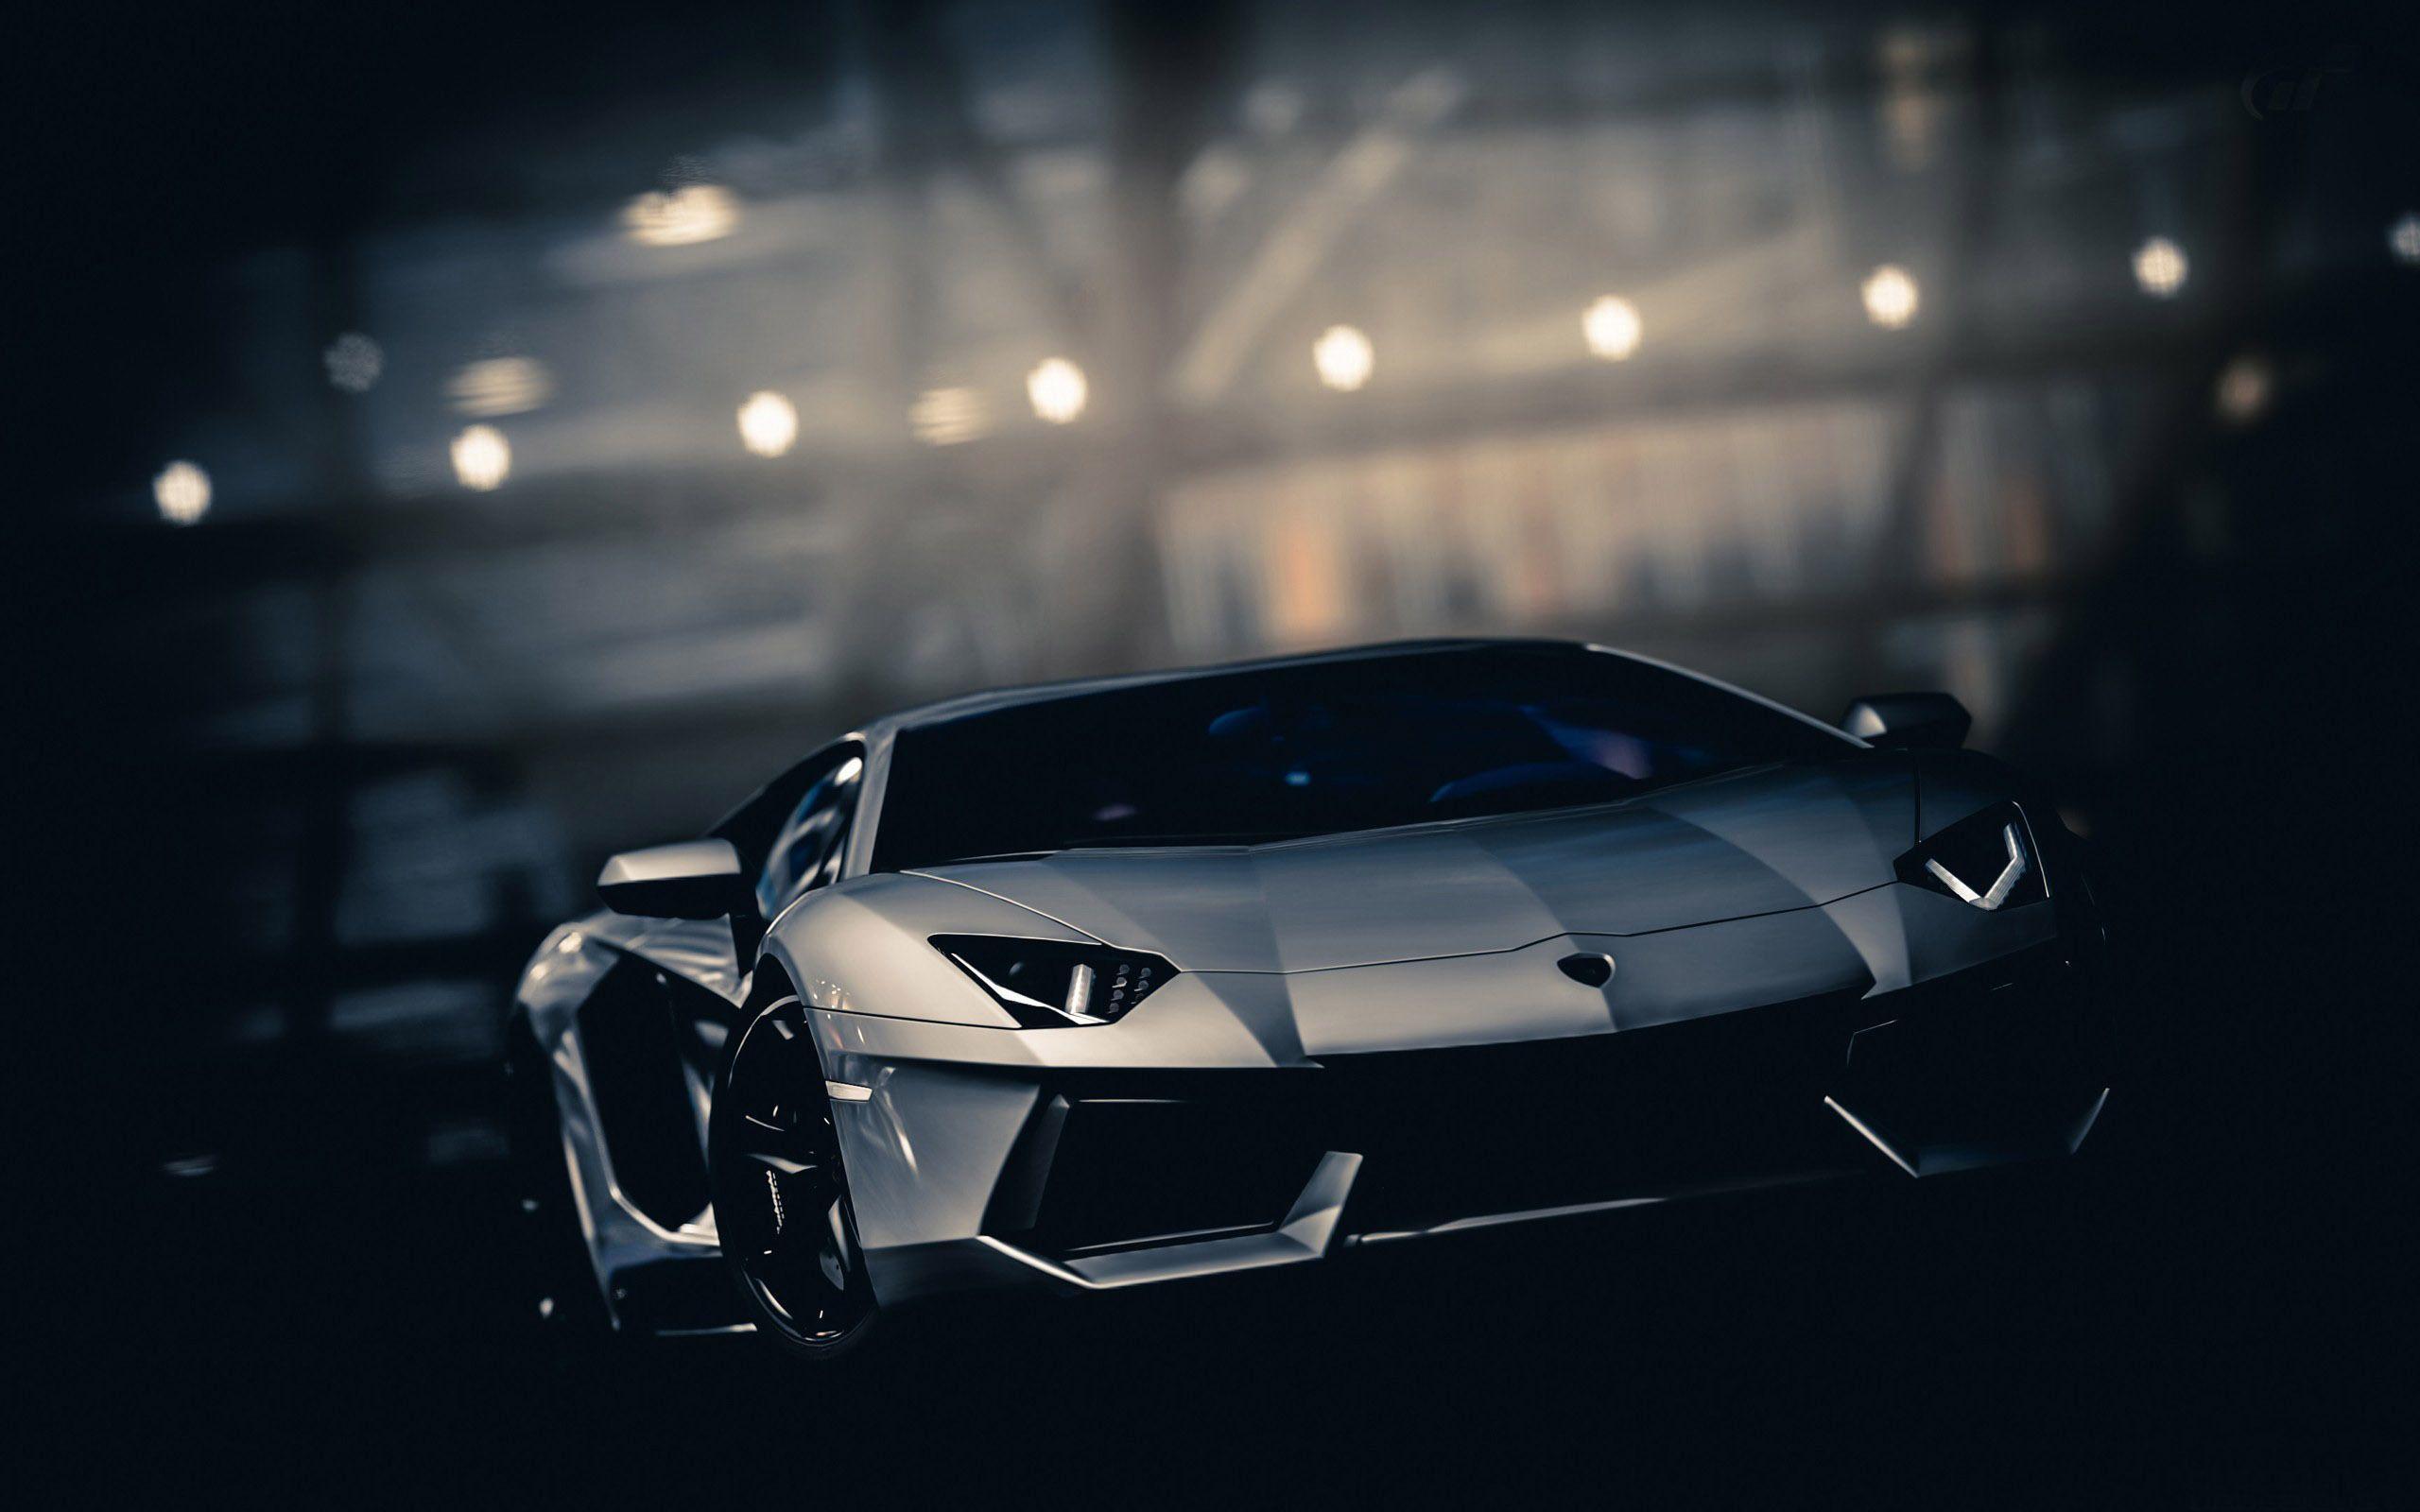 Wallpapers Full Hd 1080p Lamborghini New 2015 Wallpaper Cave